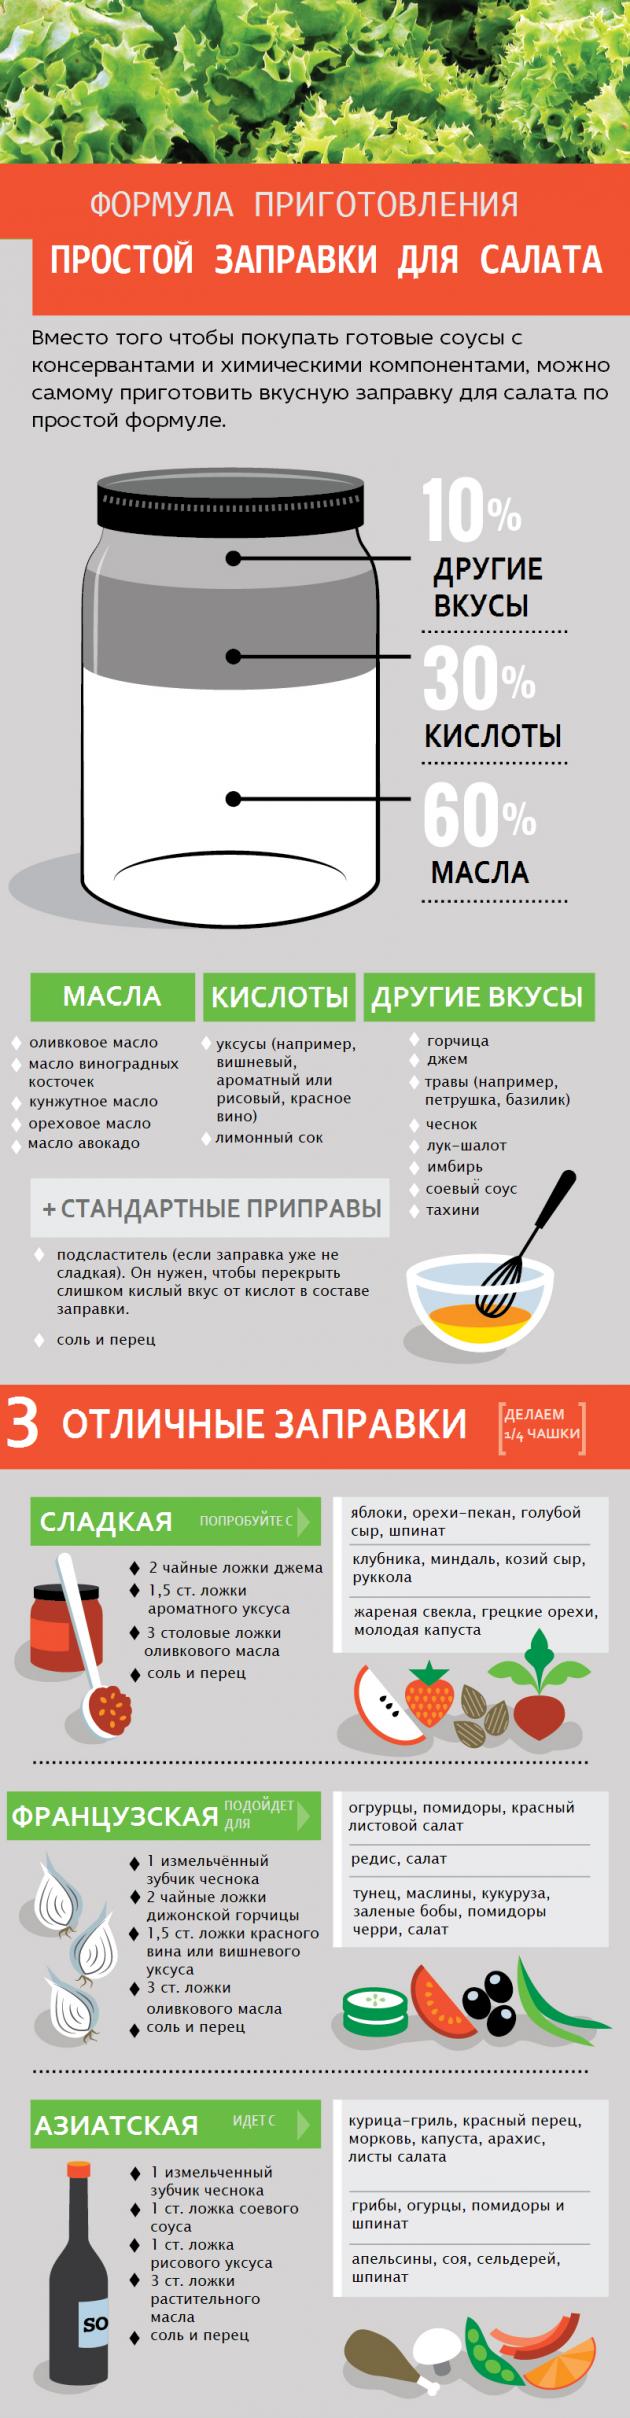 ЗАПРАВКА 1